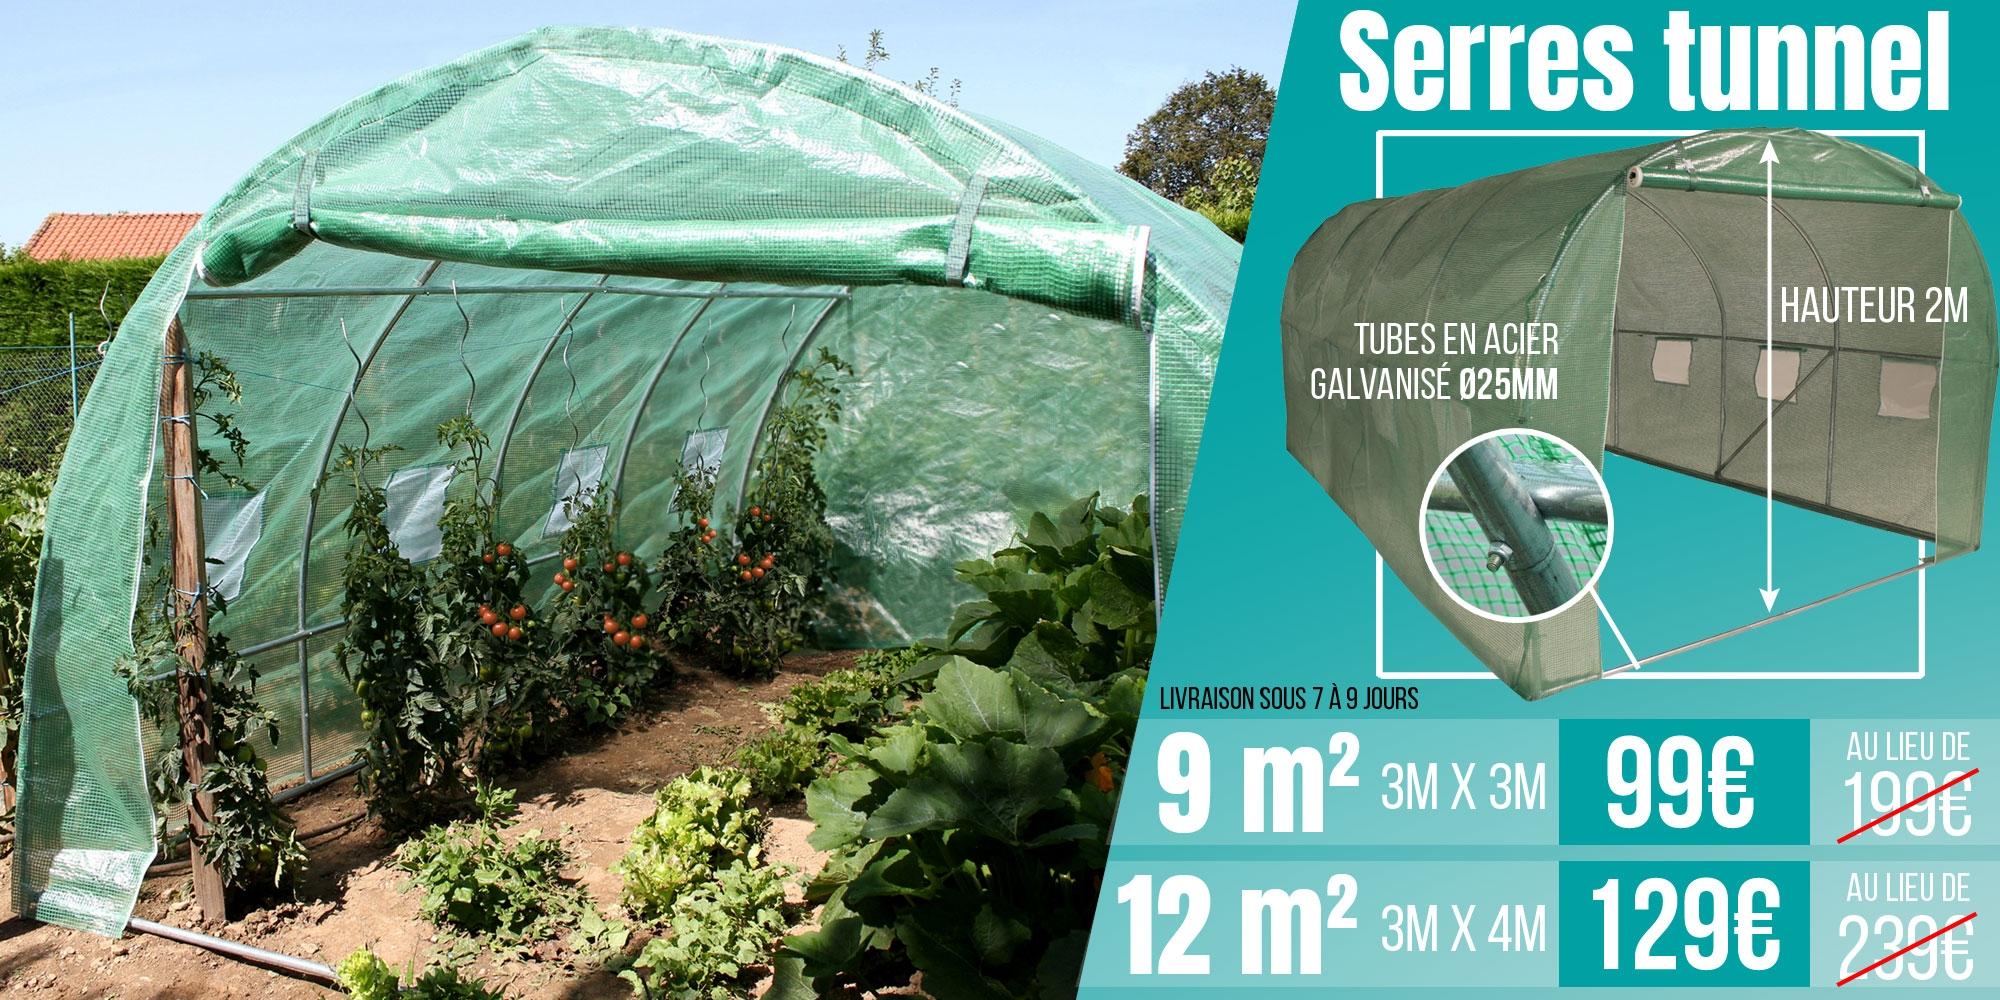 Promotion serres tunnels - serre de jardin